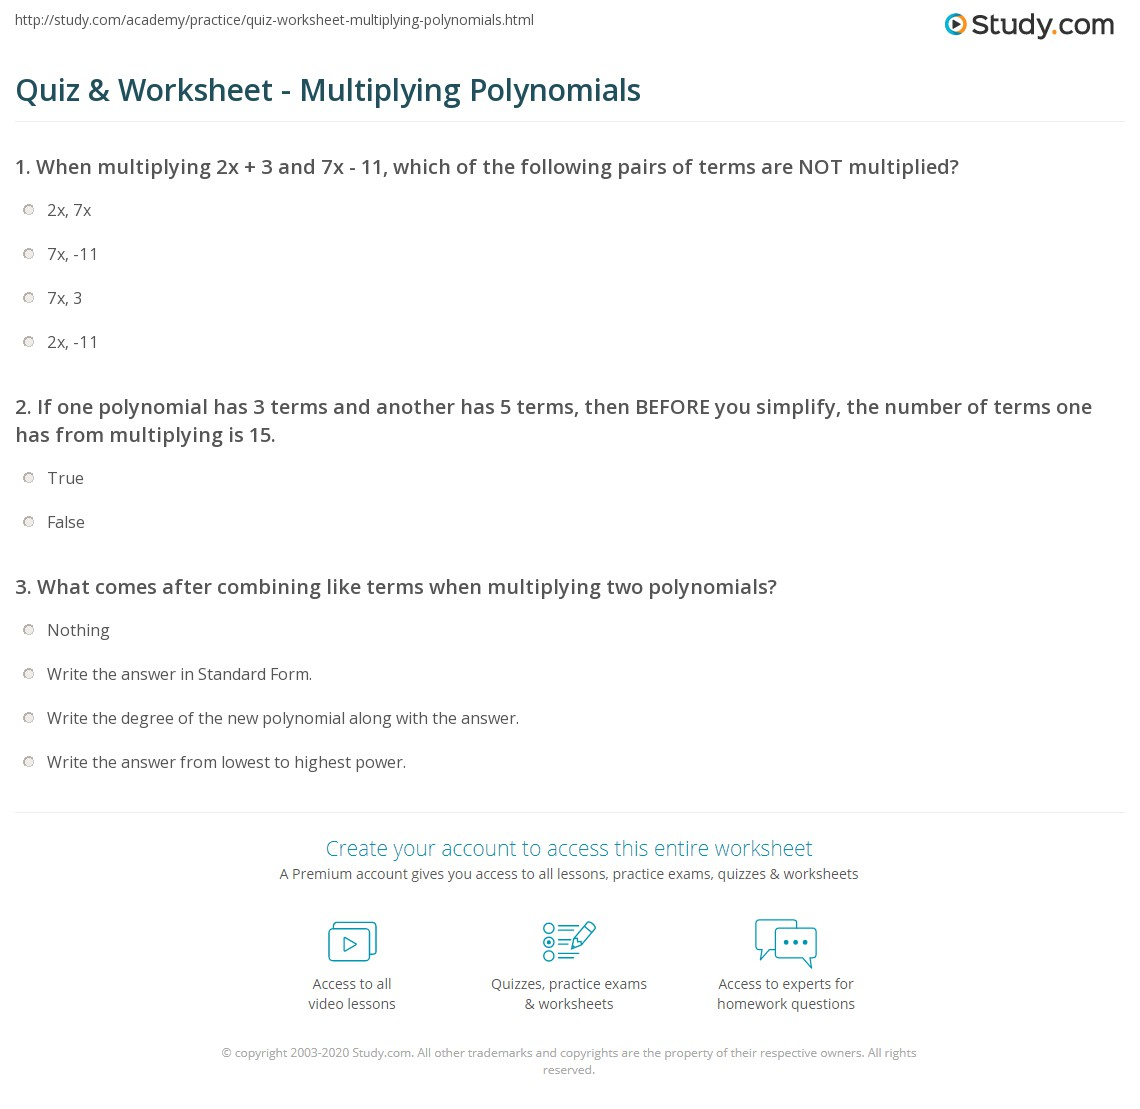 Quiz & Worksheet - Multiplying Polynomials | Study for Worksheets About Multiplication Of Polynomials